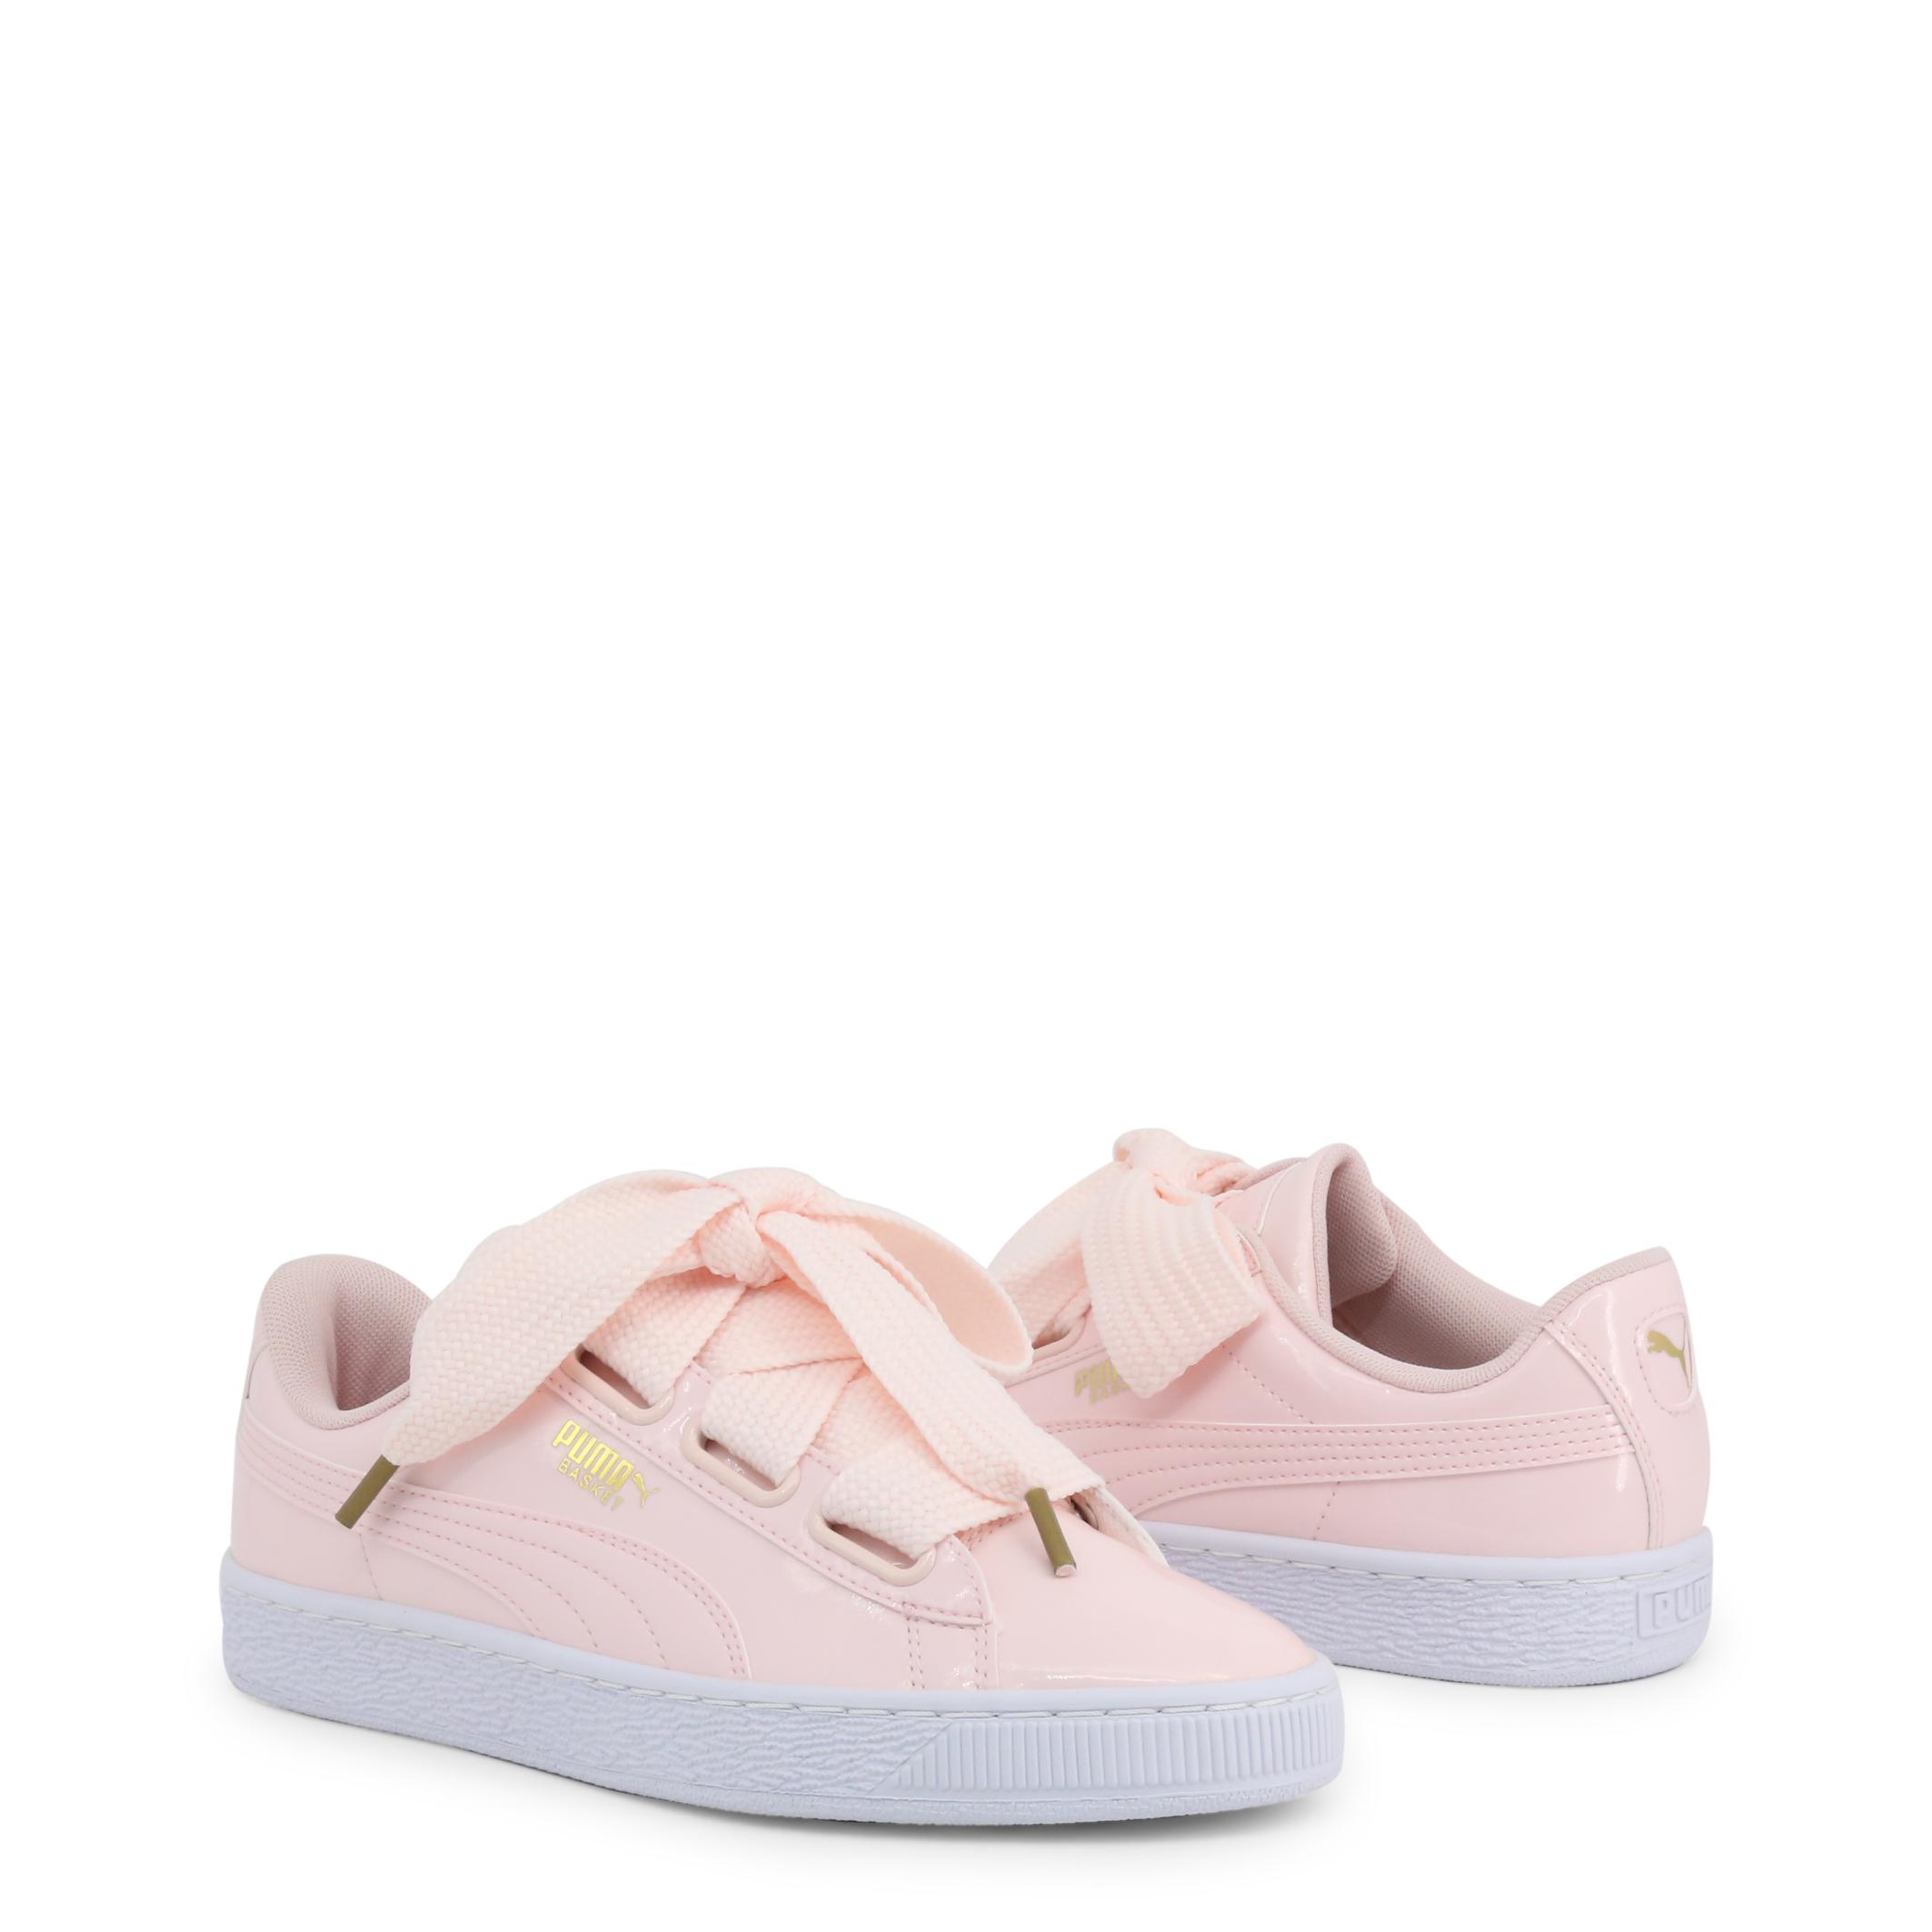 Scarpe-Puma-Donna-363073-BasketHeartPatent-Sneakers-Rosa-Bianco miniatura 2